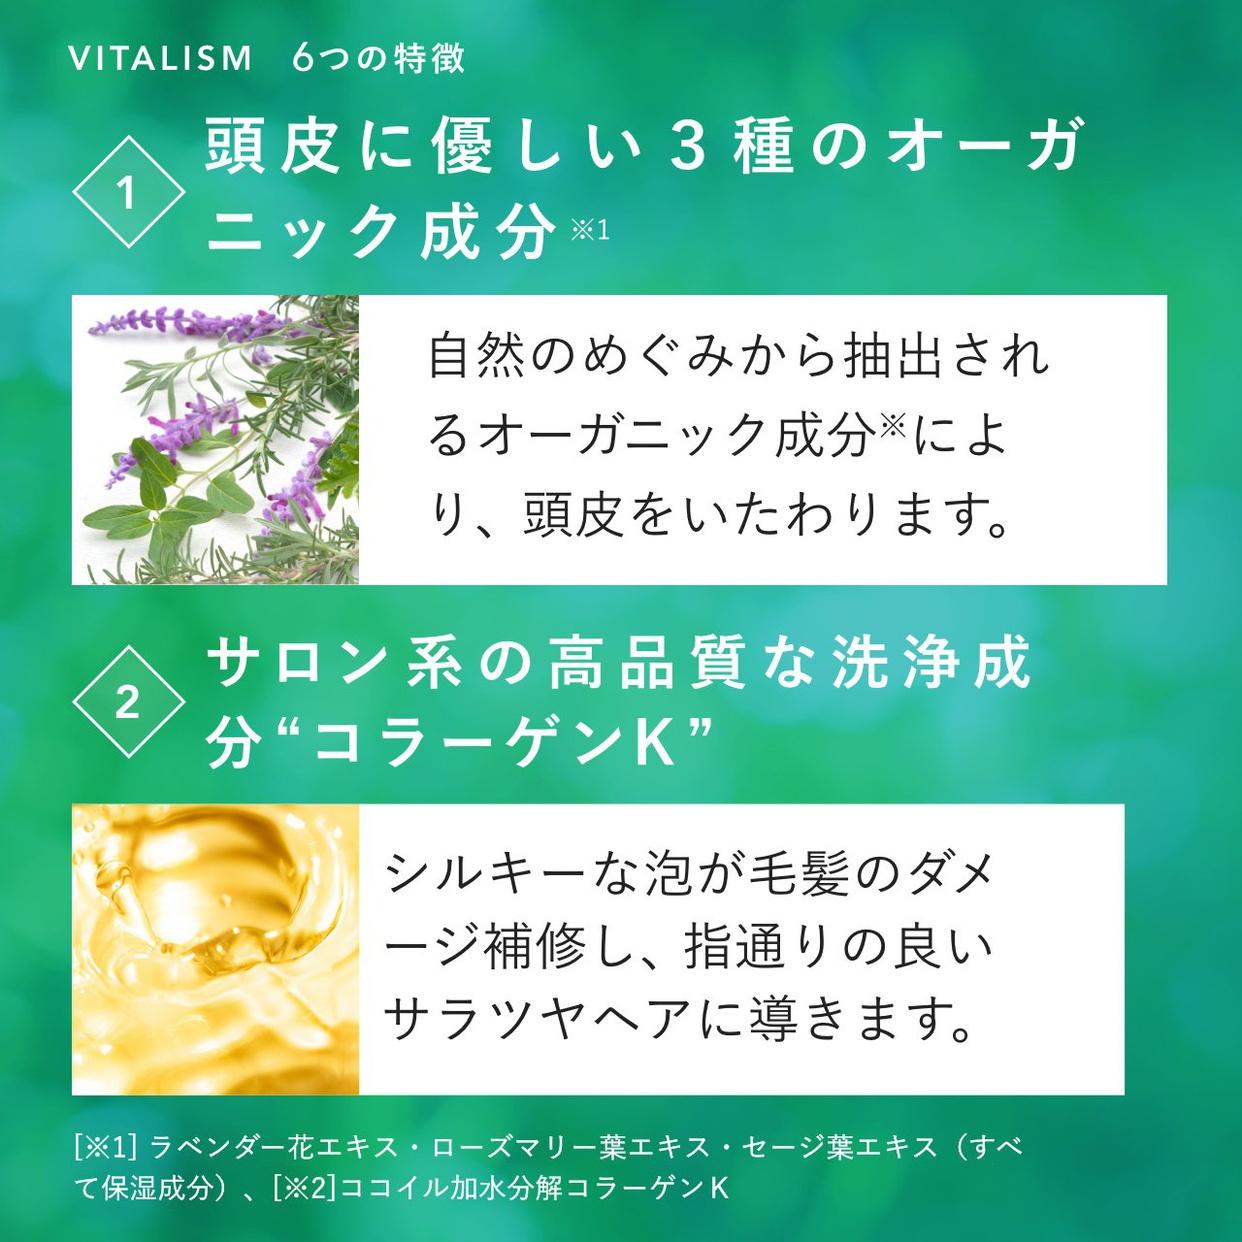 VITALISM(バイタリズム) ウーマン オーガニック スカルプ コンディショナーの商品画像4